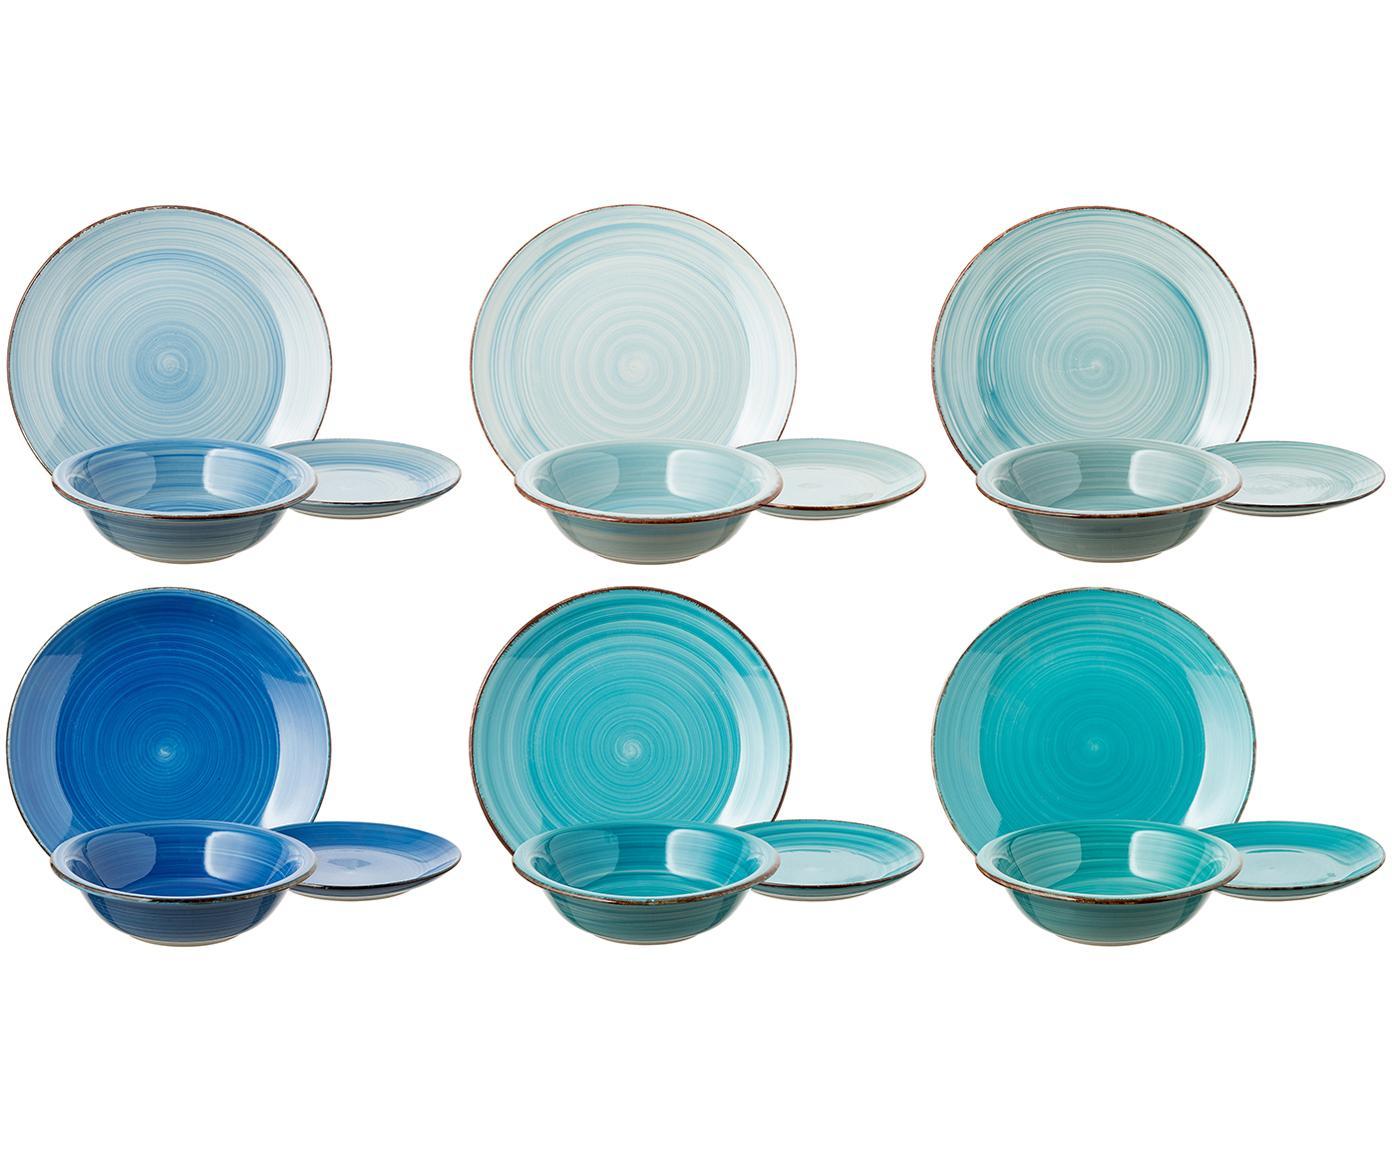 Set 18 piatti in tonalità blu Baita, 6 persone, Terracotta (Hard Dolomite), dipinto a mano, Tonalità blu, menta, turchesi, Diverse dimensioni